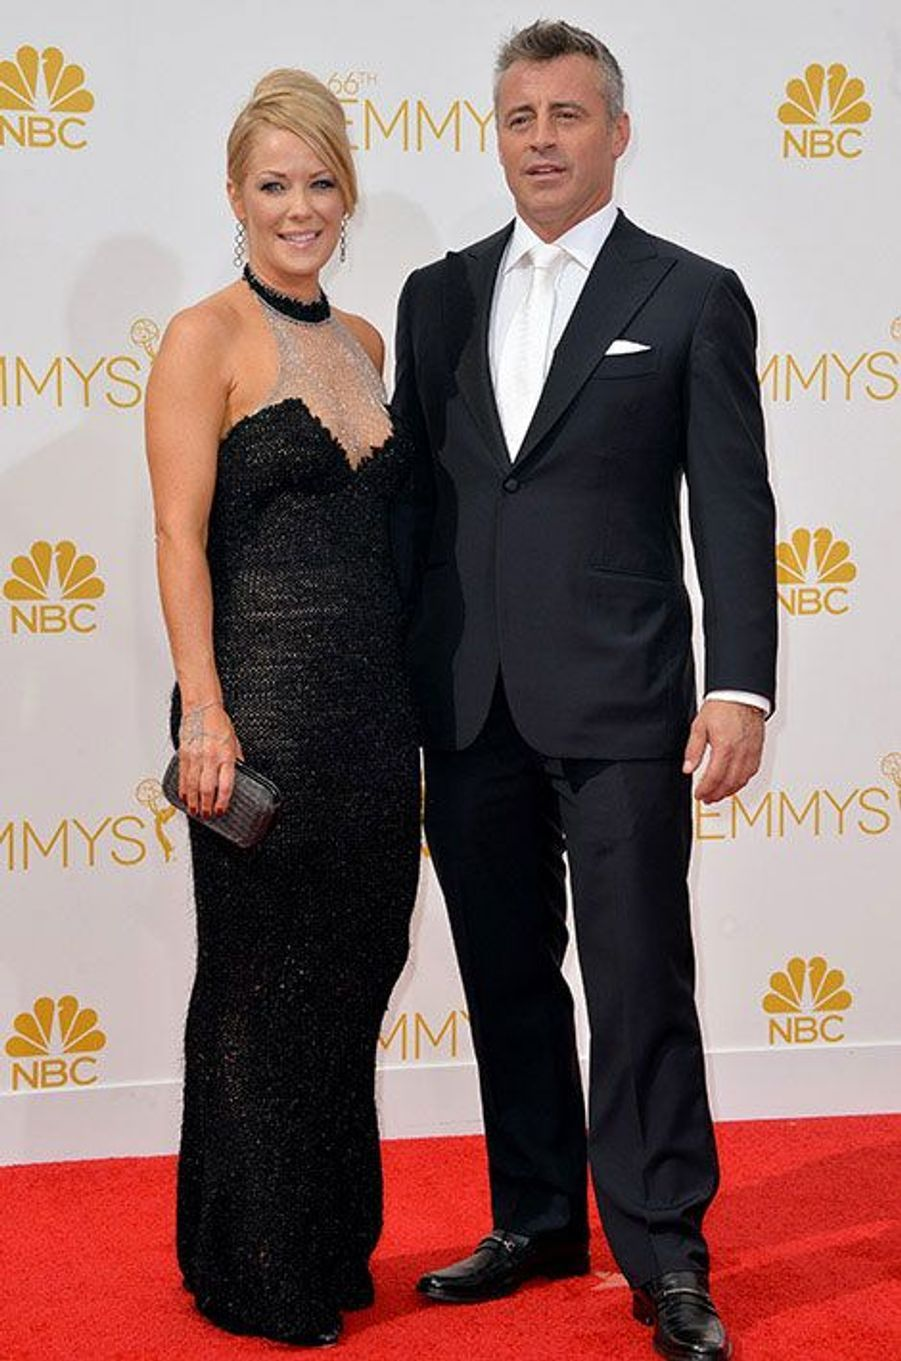 Matt LeBlanc aux Emmy Awards 2014